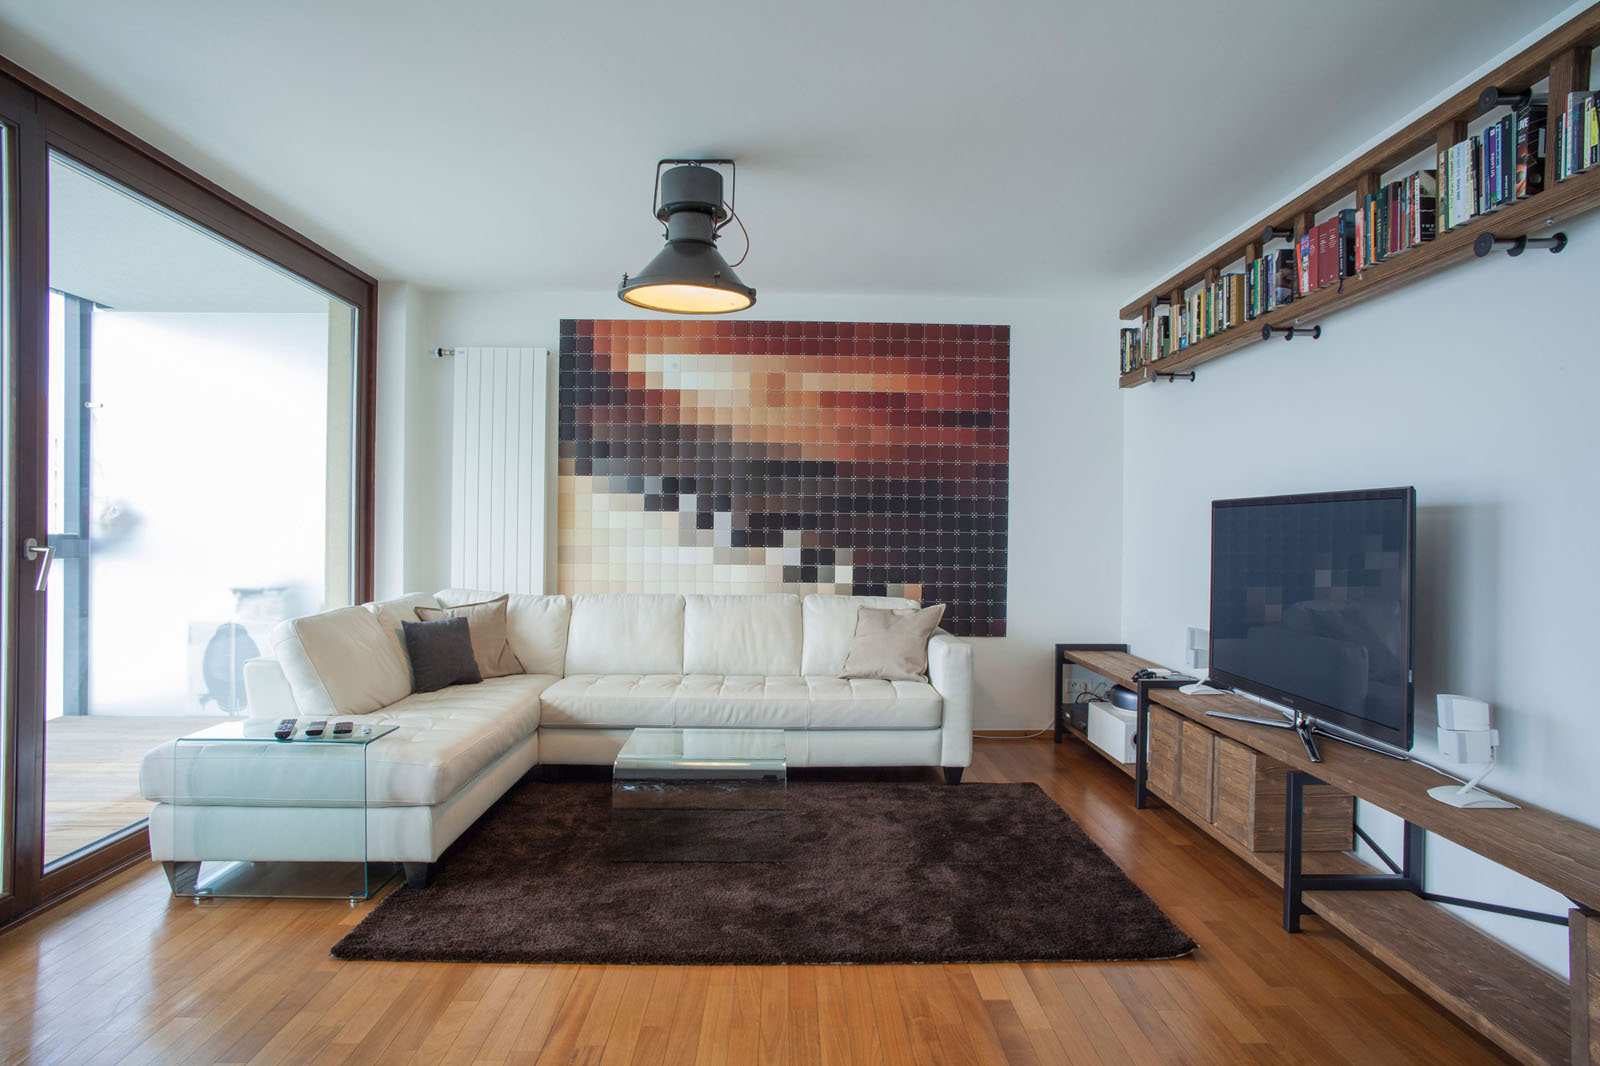 Triplex Loft Apartment Maximizes Natural Light ...